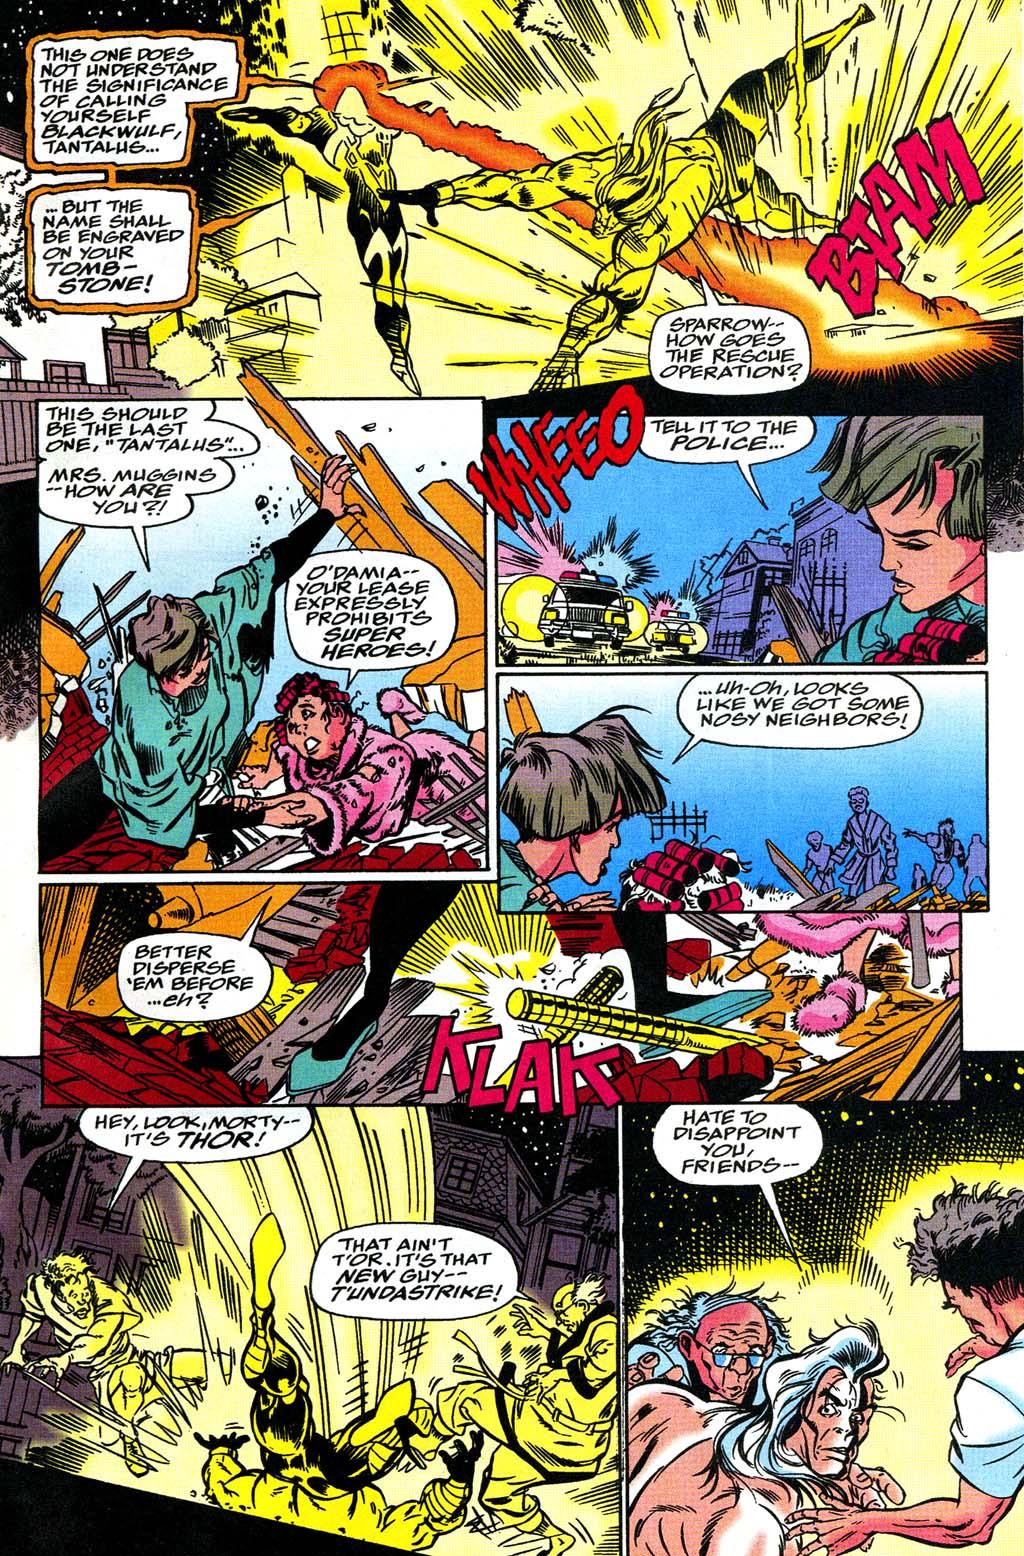 Read online Blackwulf comic -  Issue #8 - 11